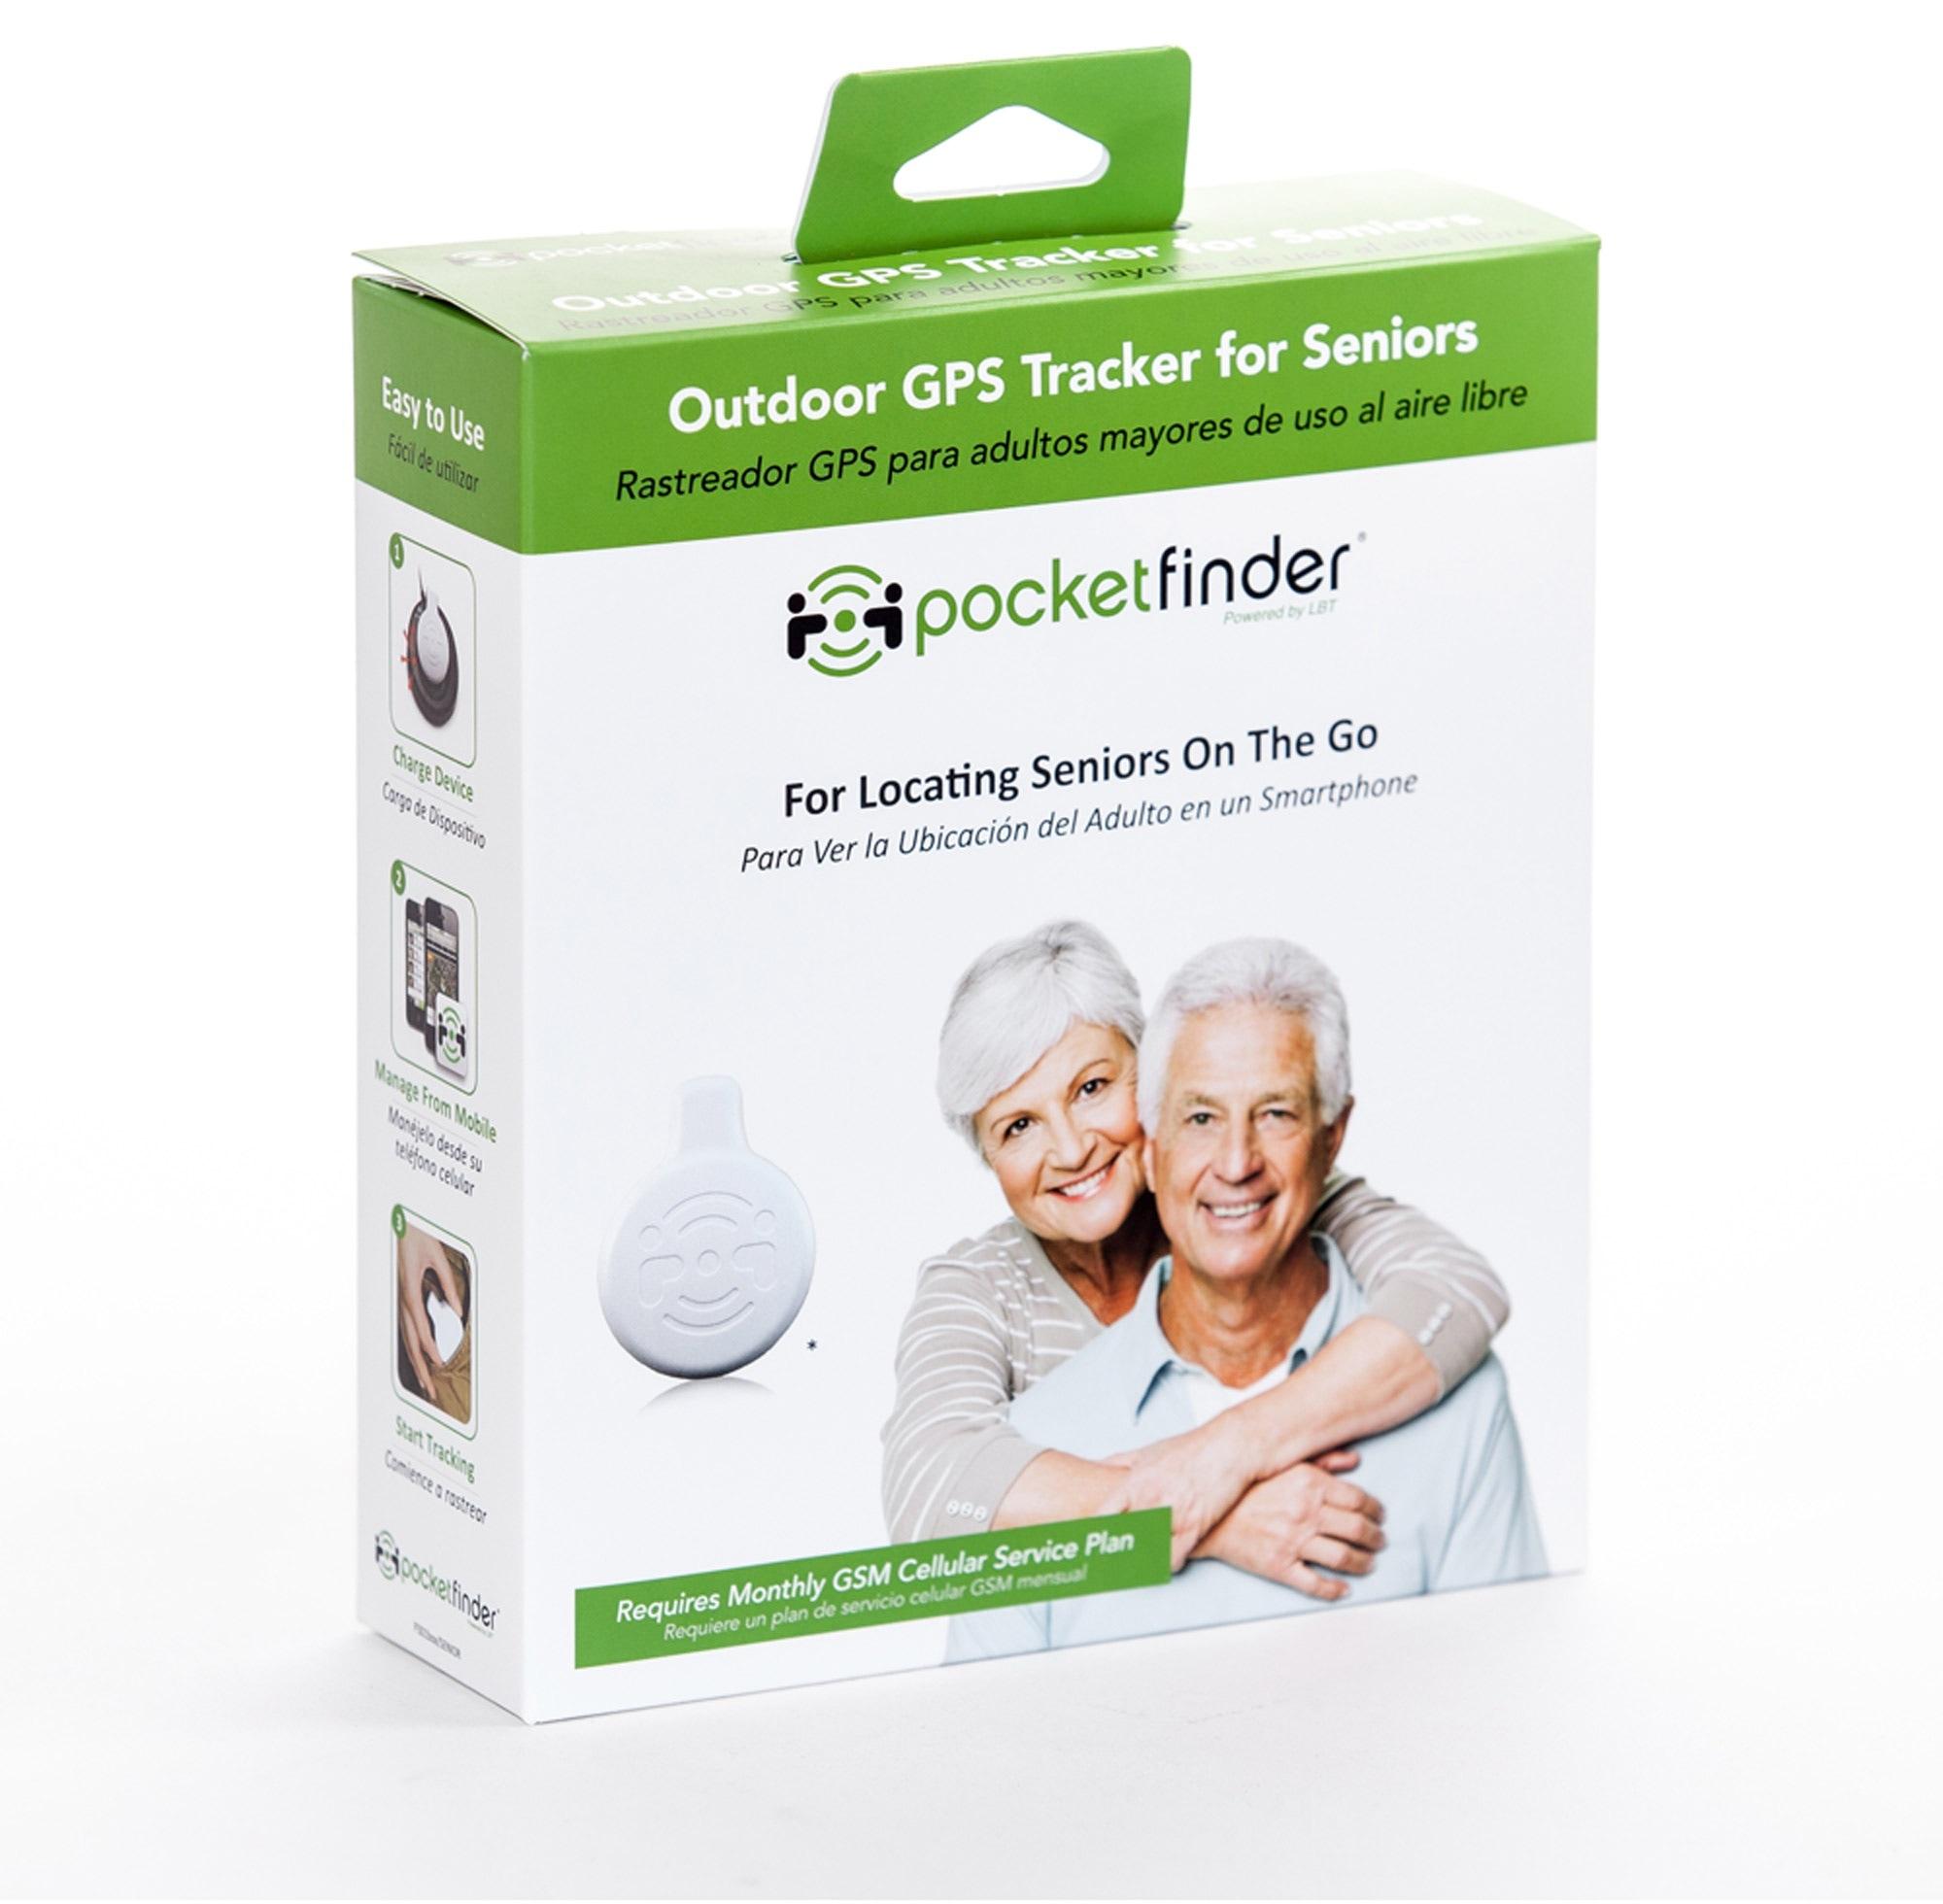 PocketFinder, da Location Based Technologies (LBT)